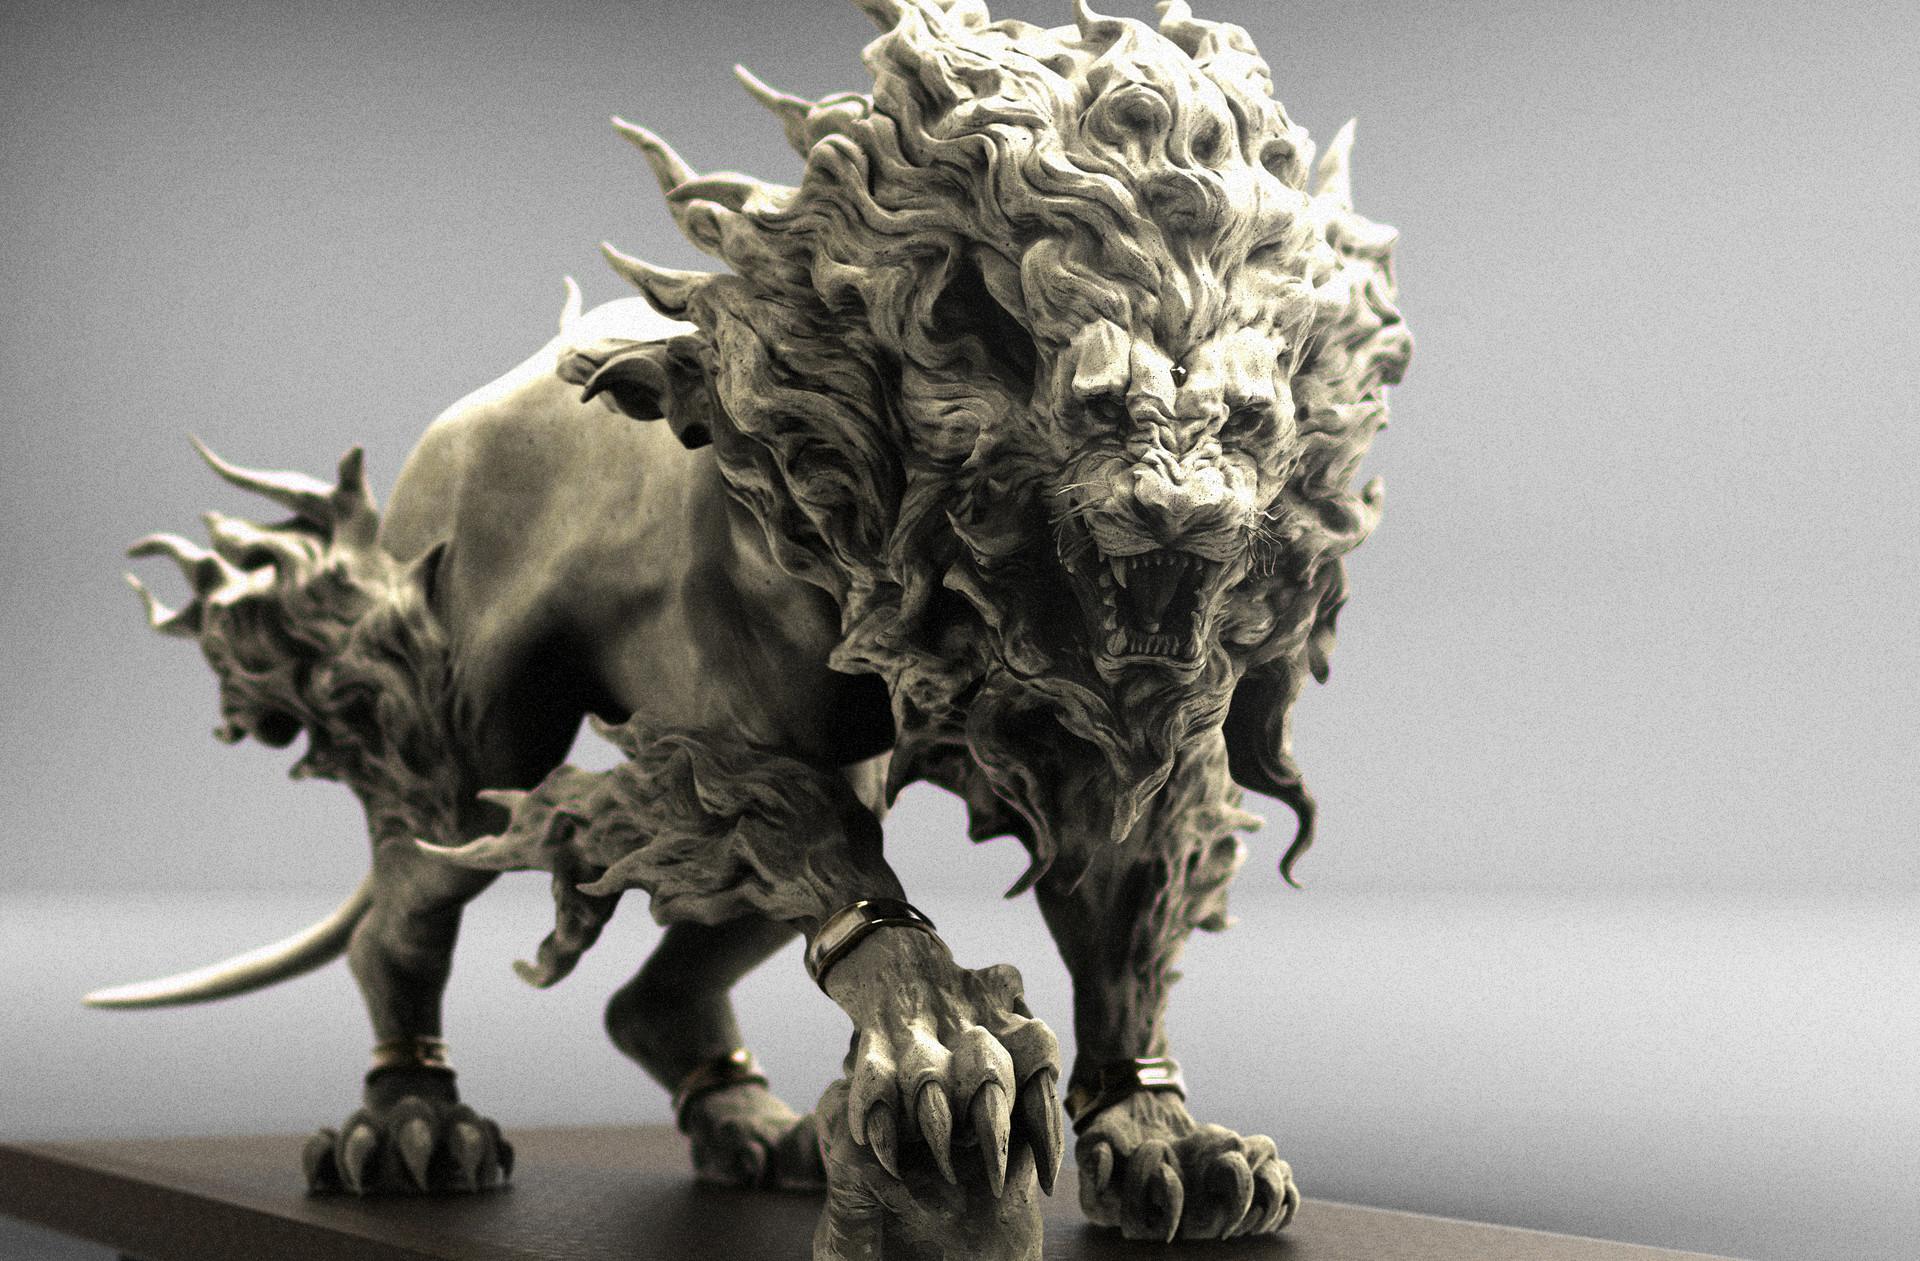 keita okada, Digital sculptor - lion